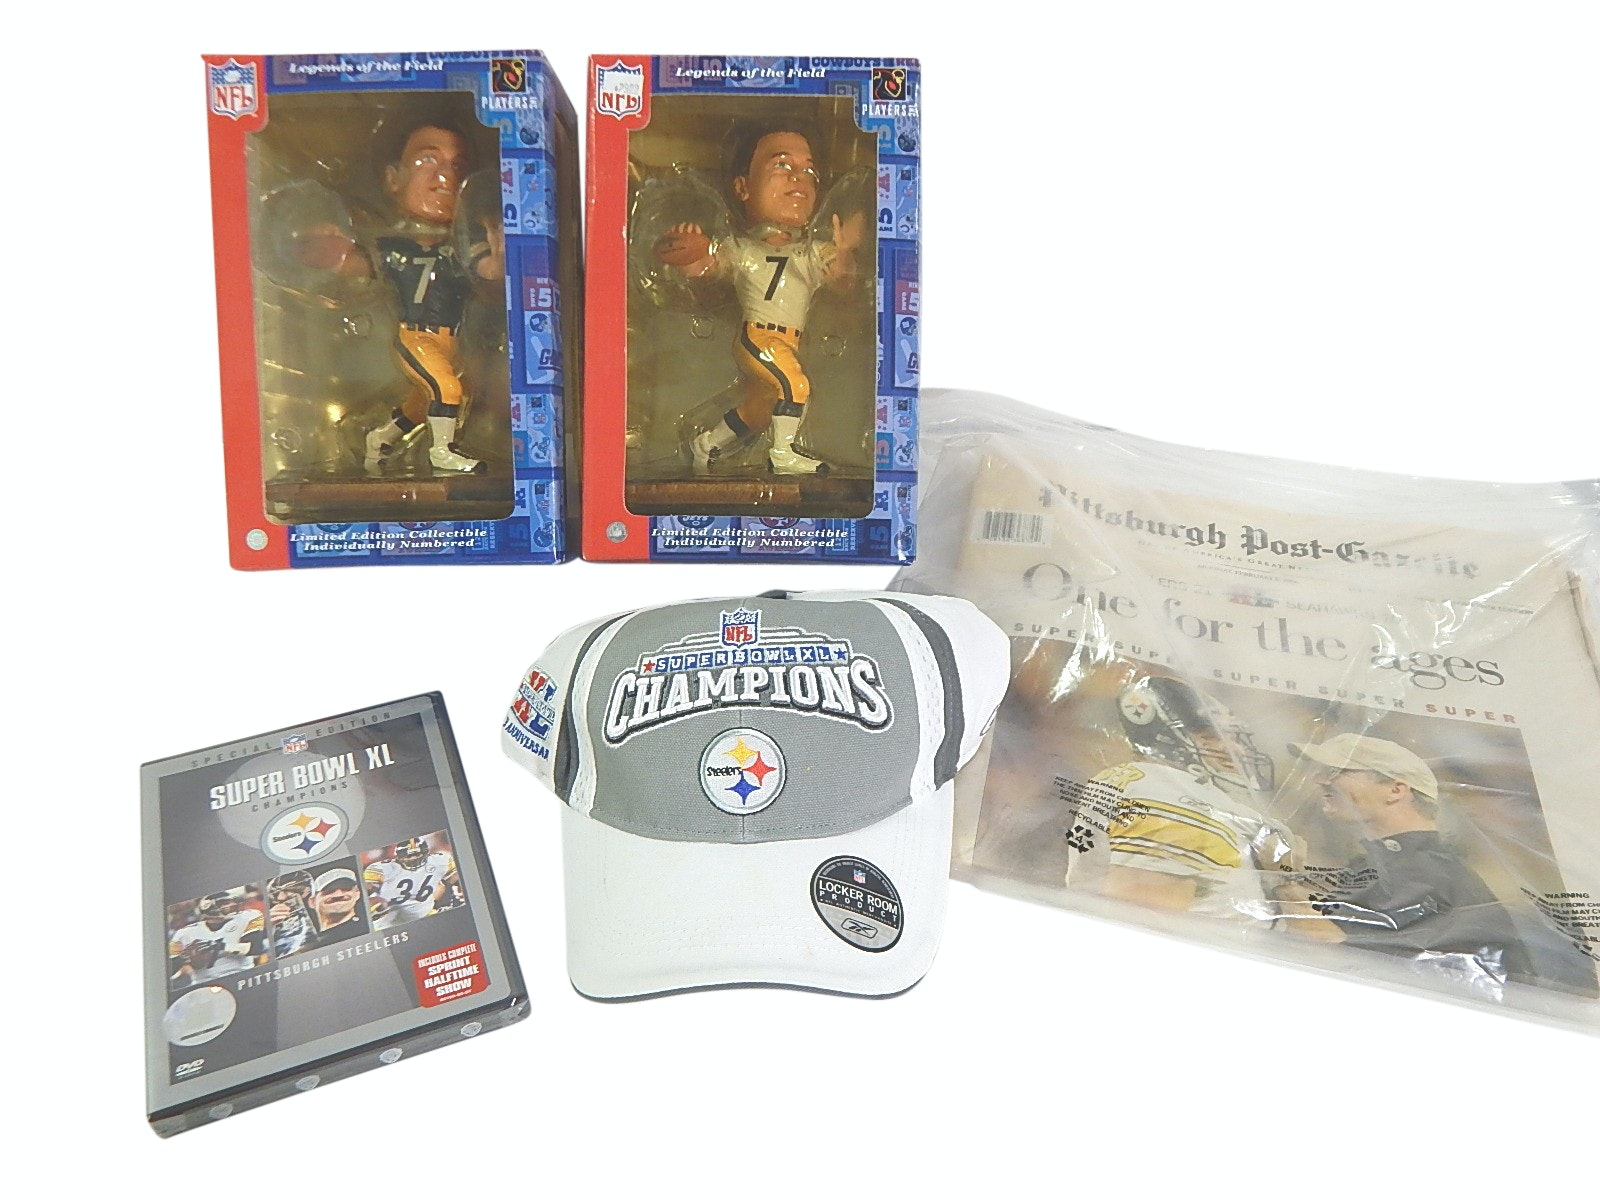 Pittsburgh Steelers Sports Memorabilia with Roethlisberger Bobbleheads